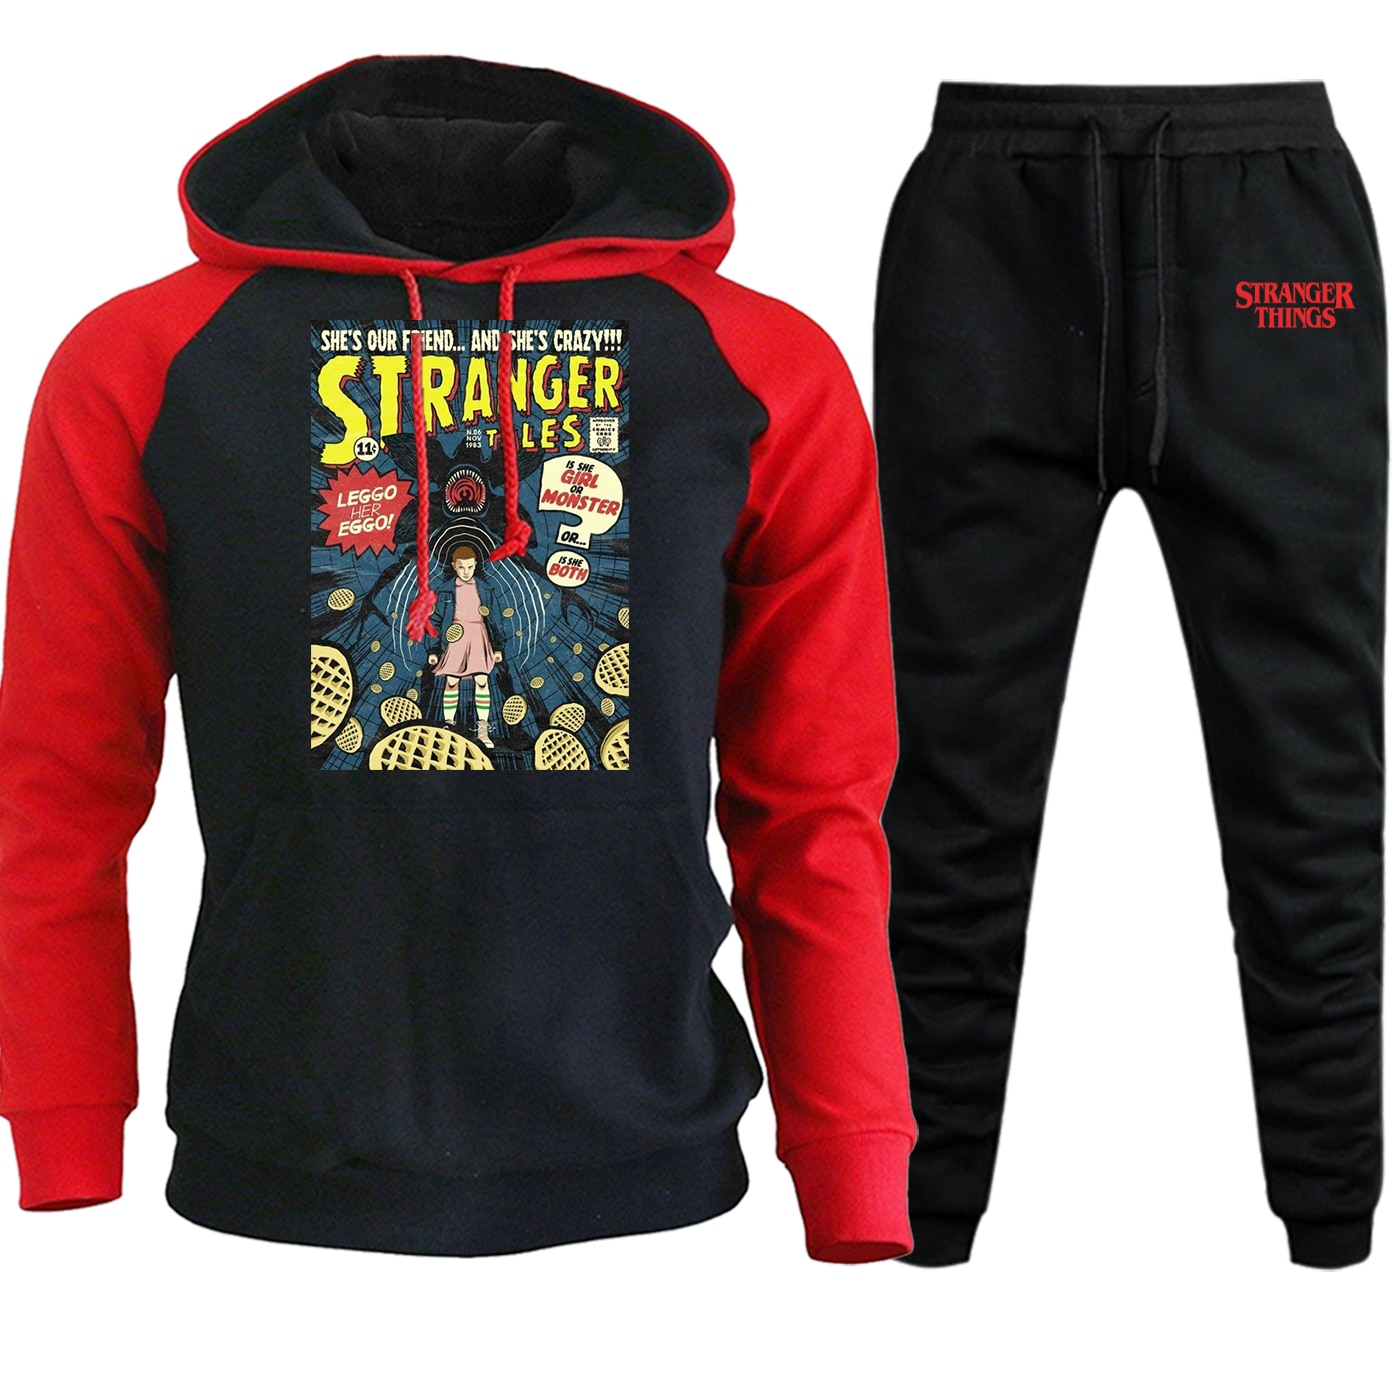 Stranger Things Autumn Winter New 2019 Mens Hooded Raglan Sweatshirts Suit Fashion Pullover Fleece Streetwear+Pants 2 Piece Set